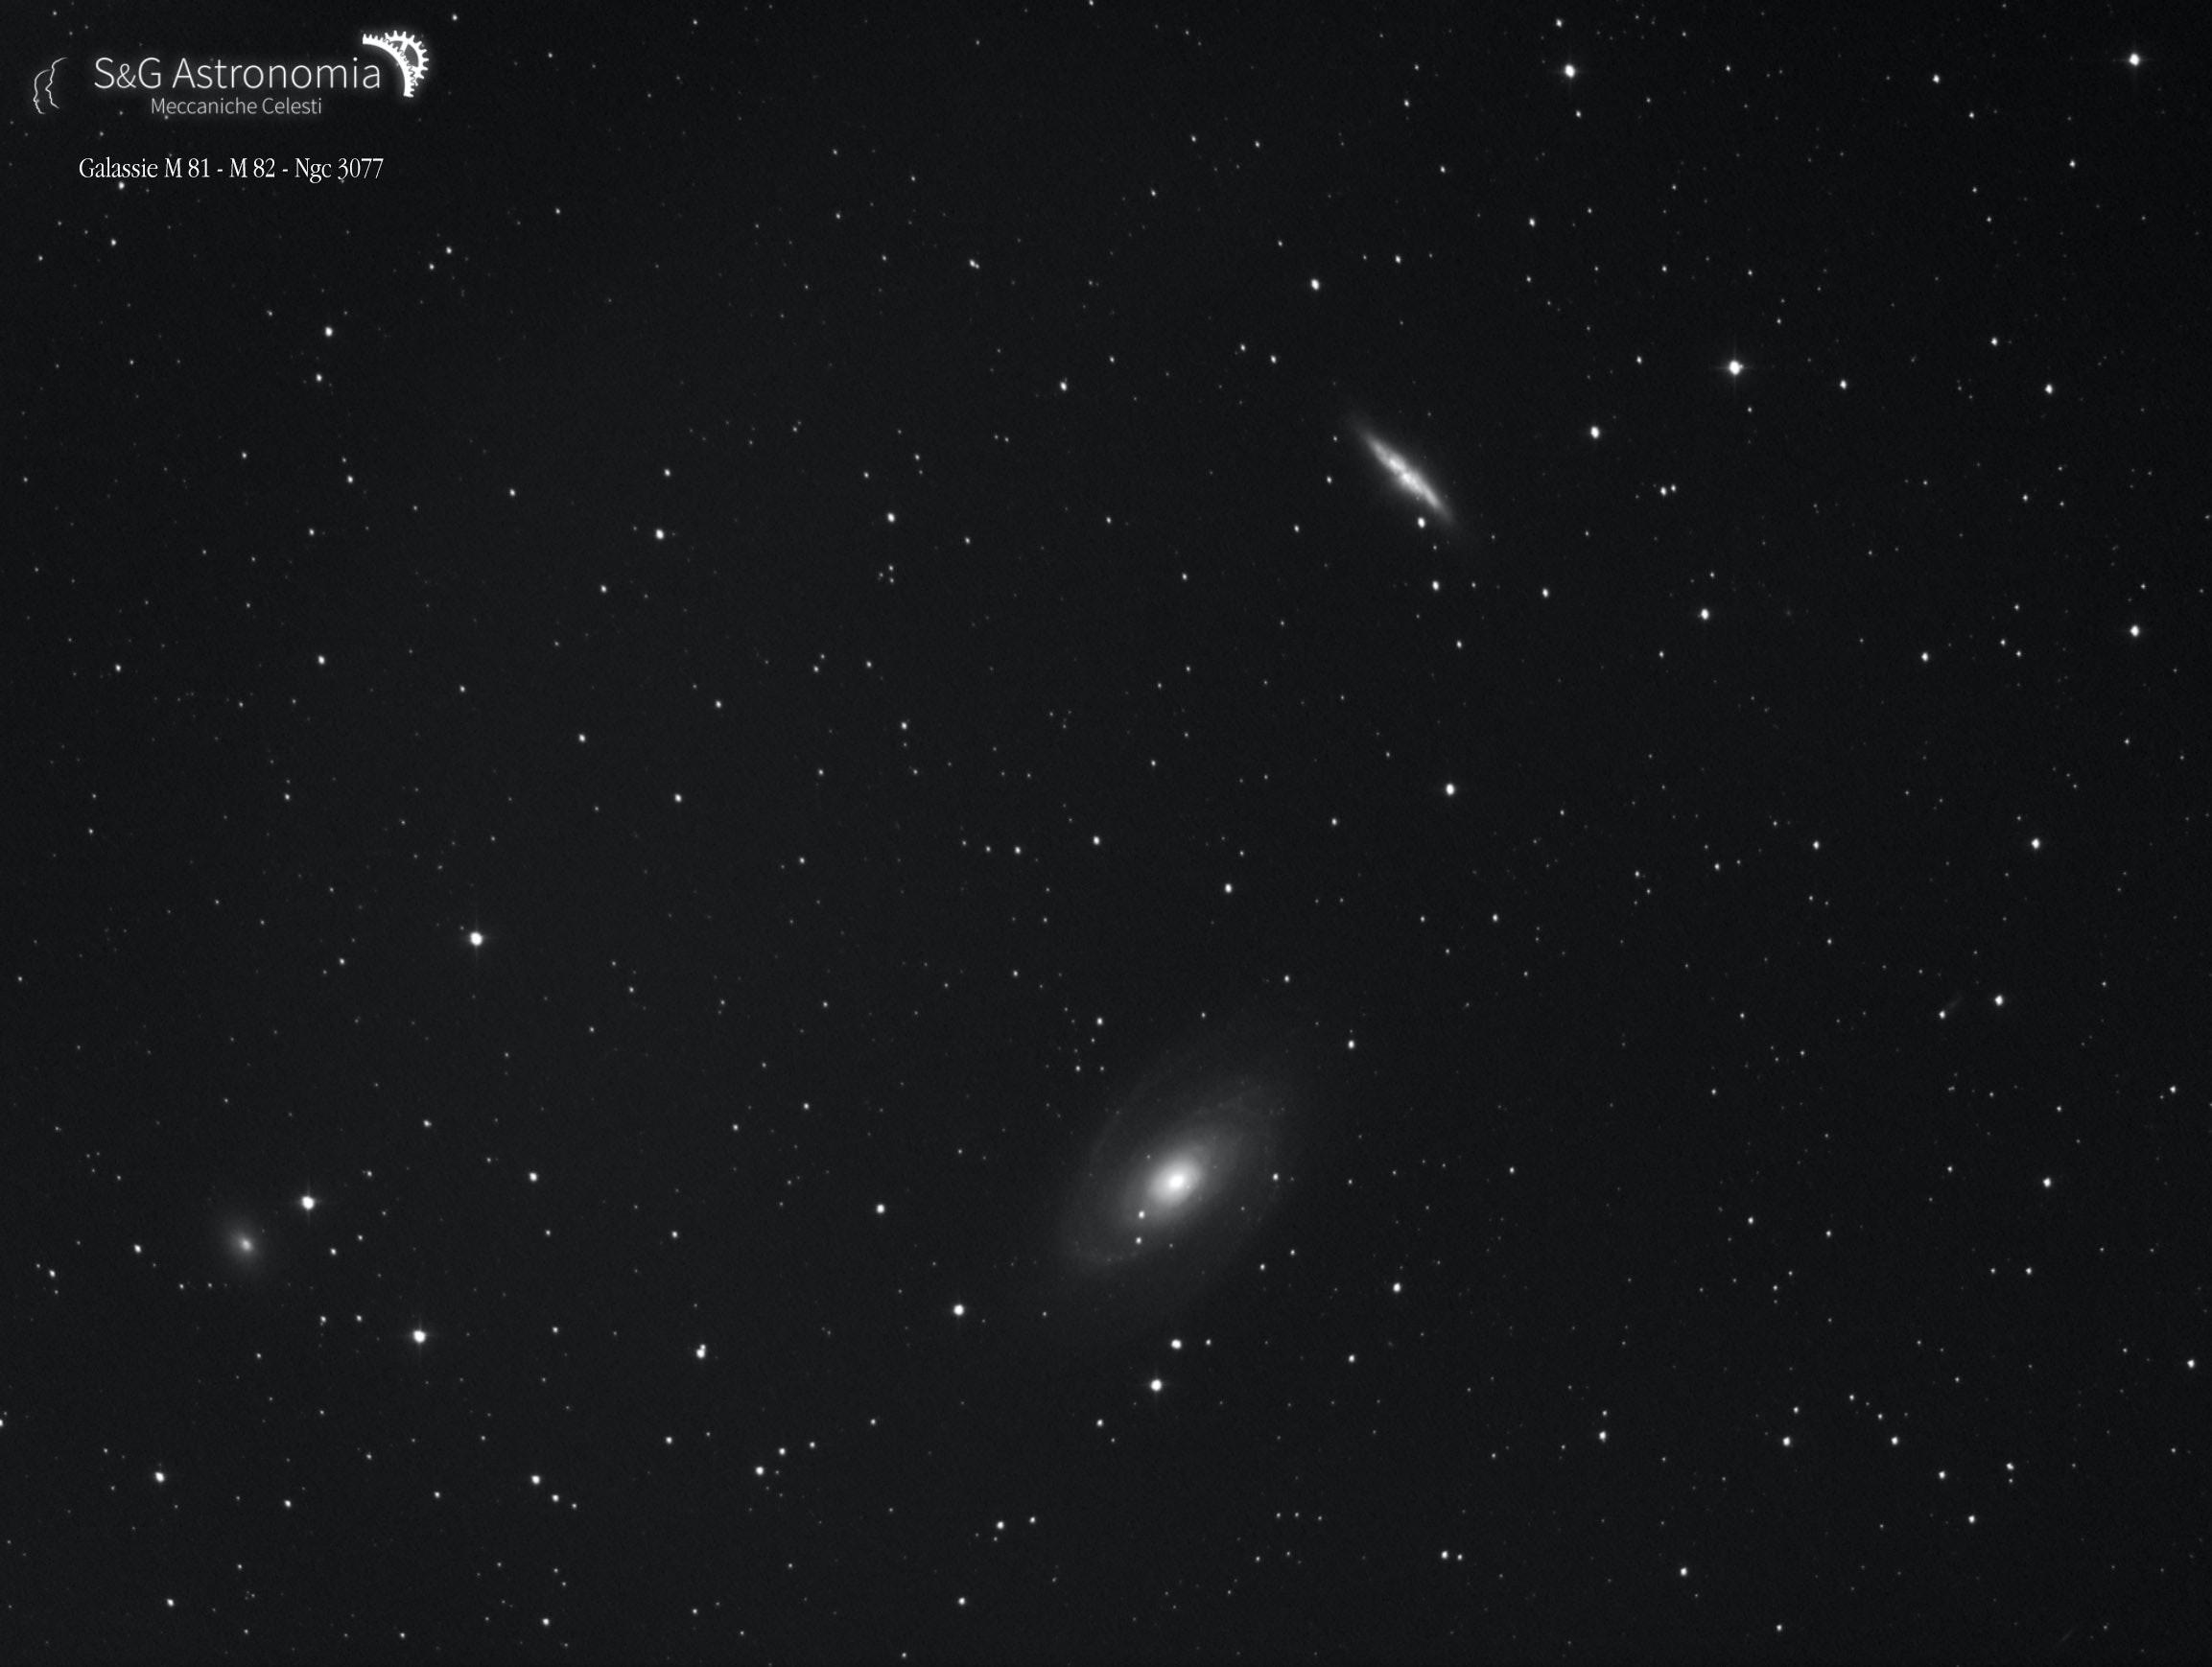 Kostenloses foto zum thema: astrofotografie astronomie fernglas